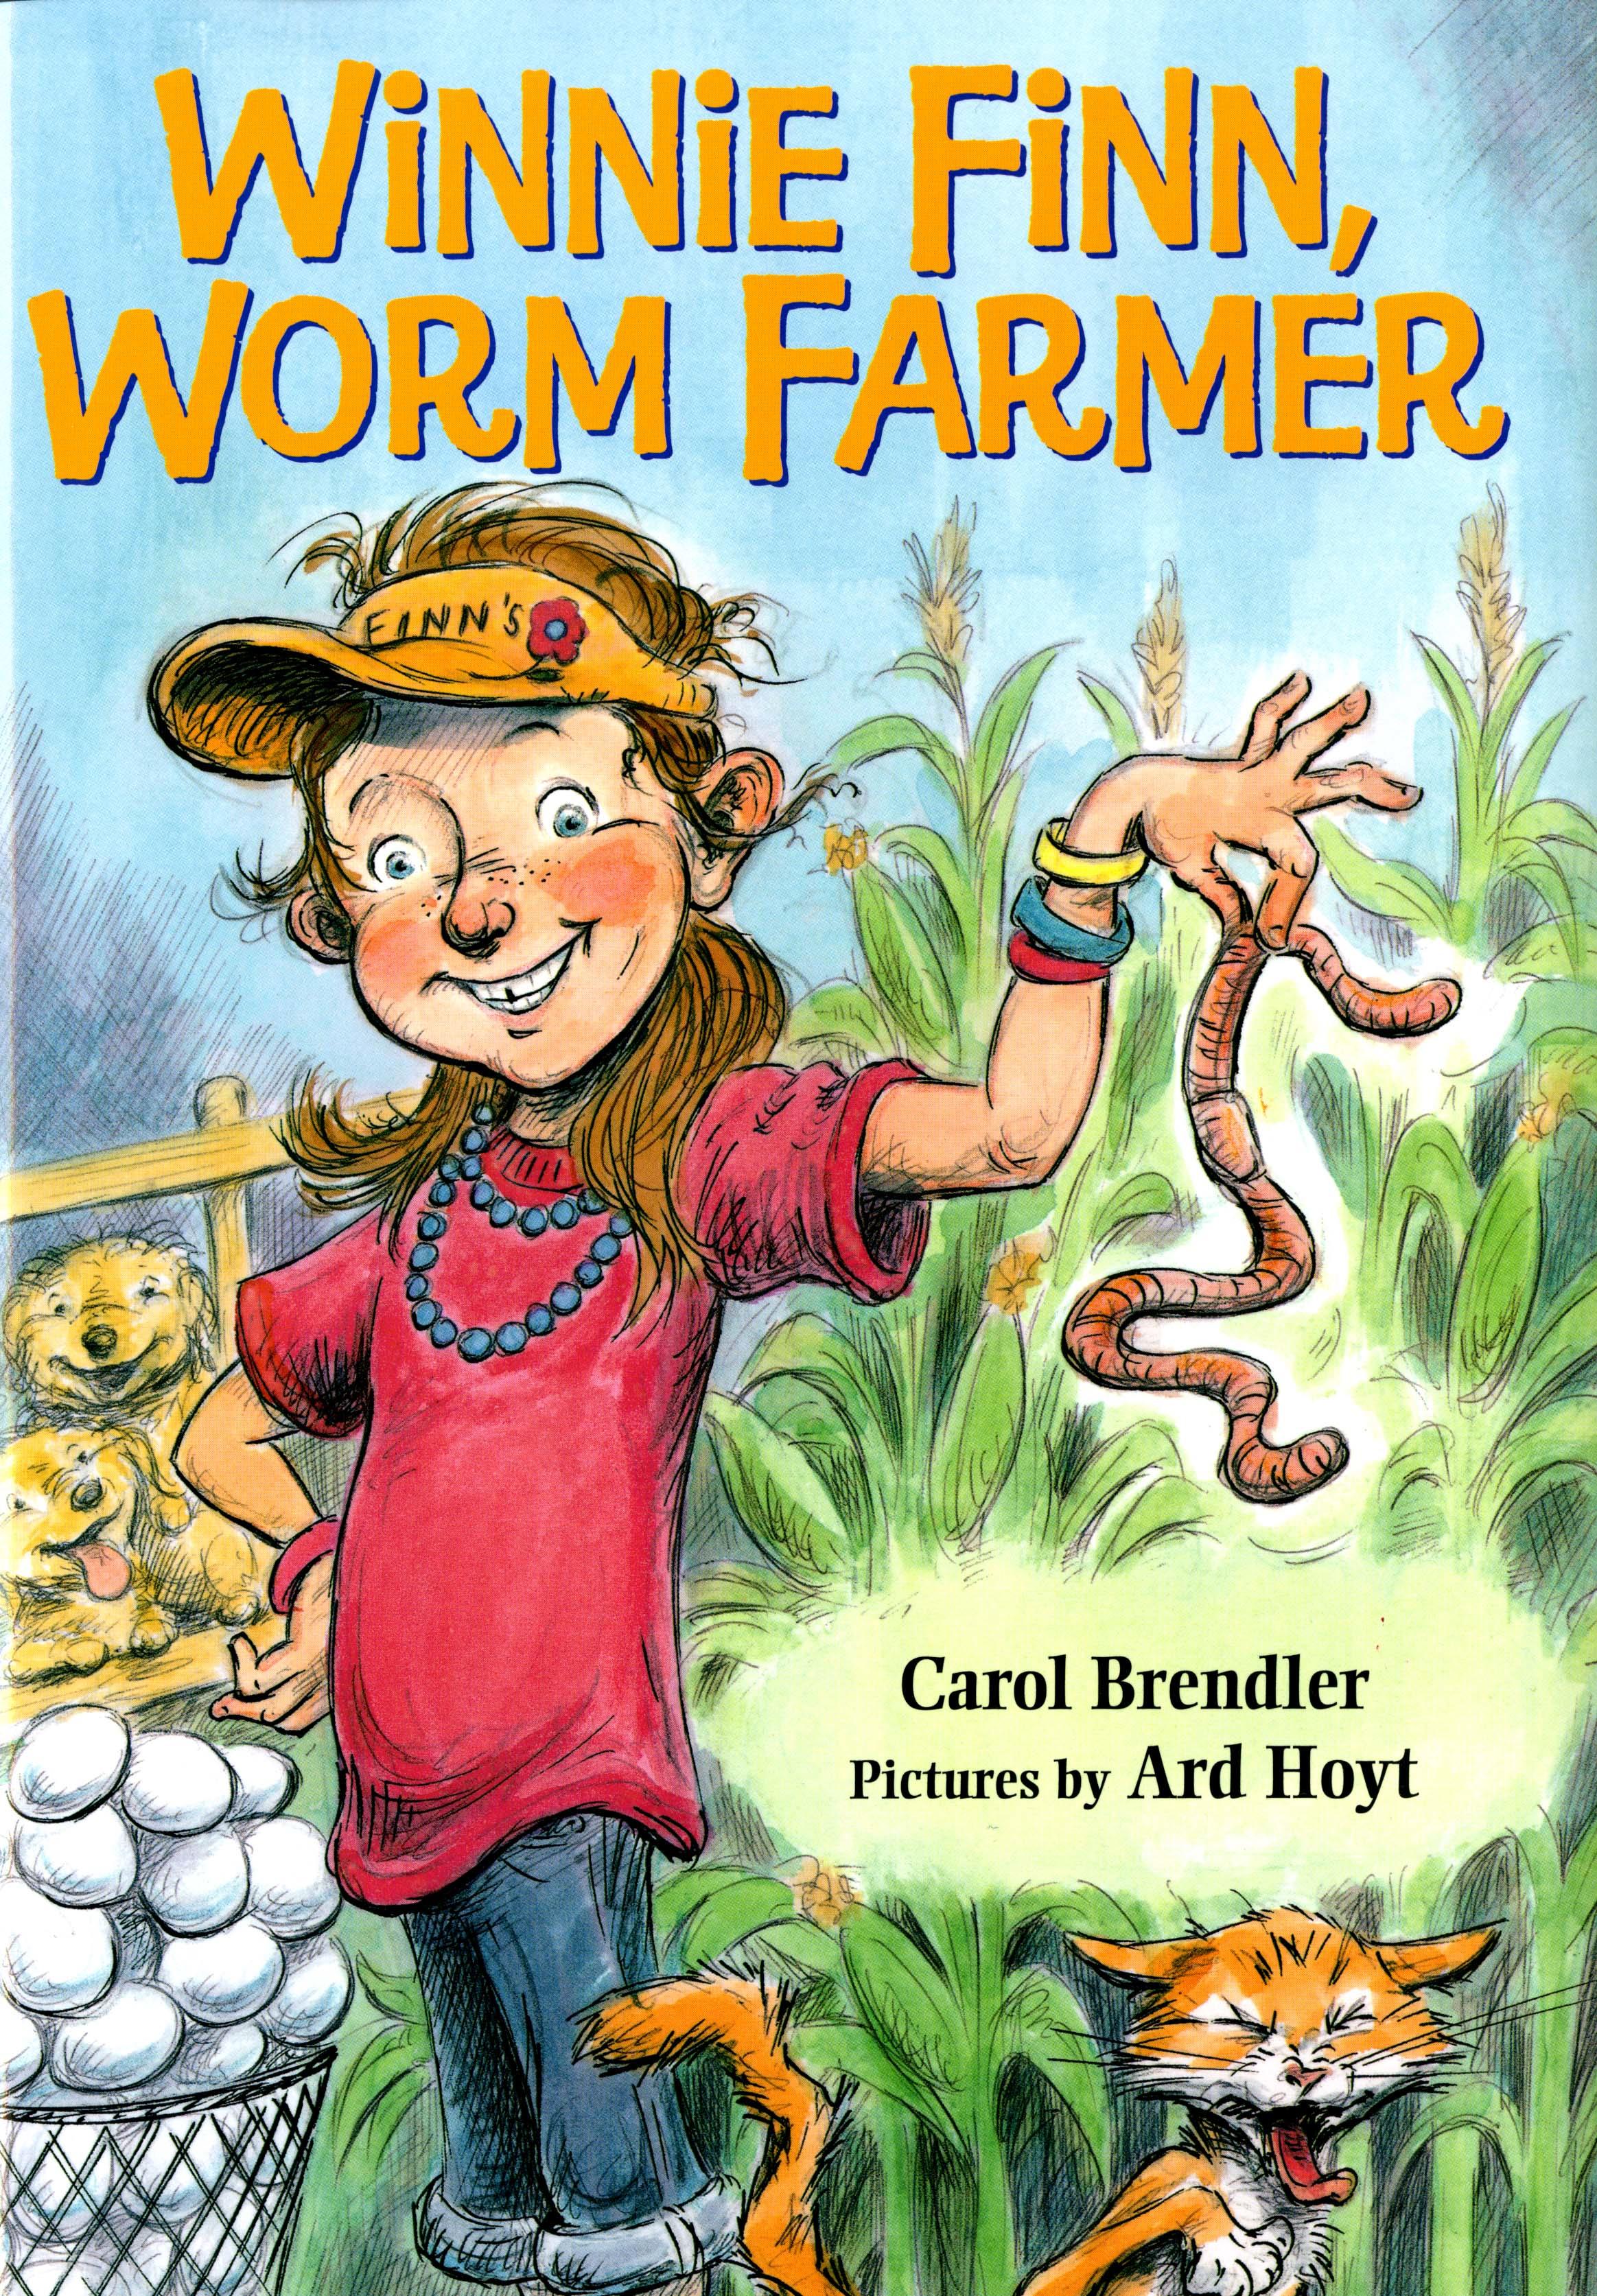 Winnie Finn, Worm Farmer